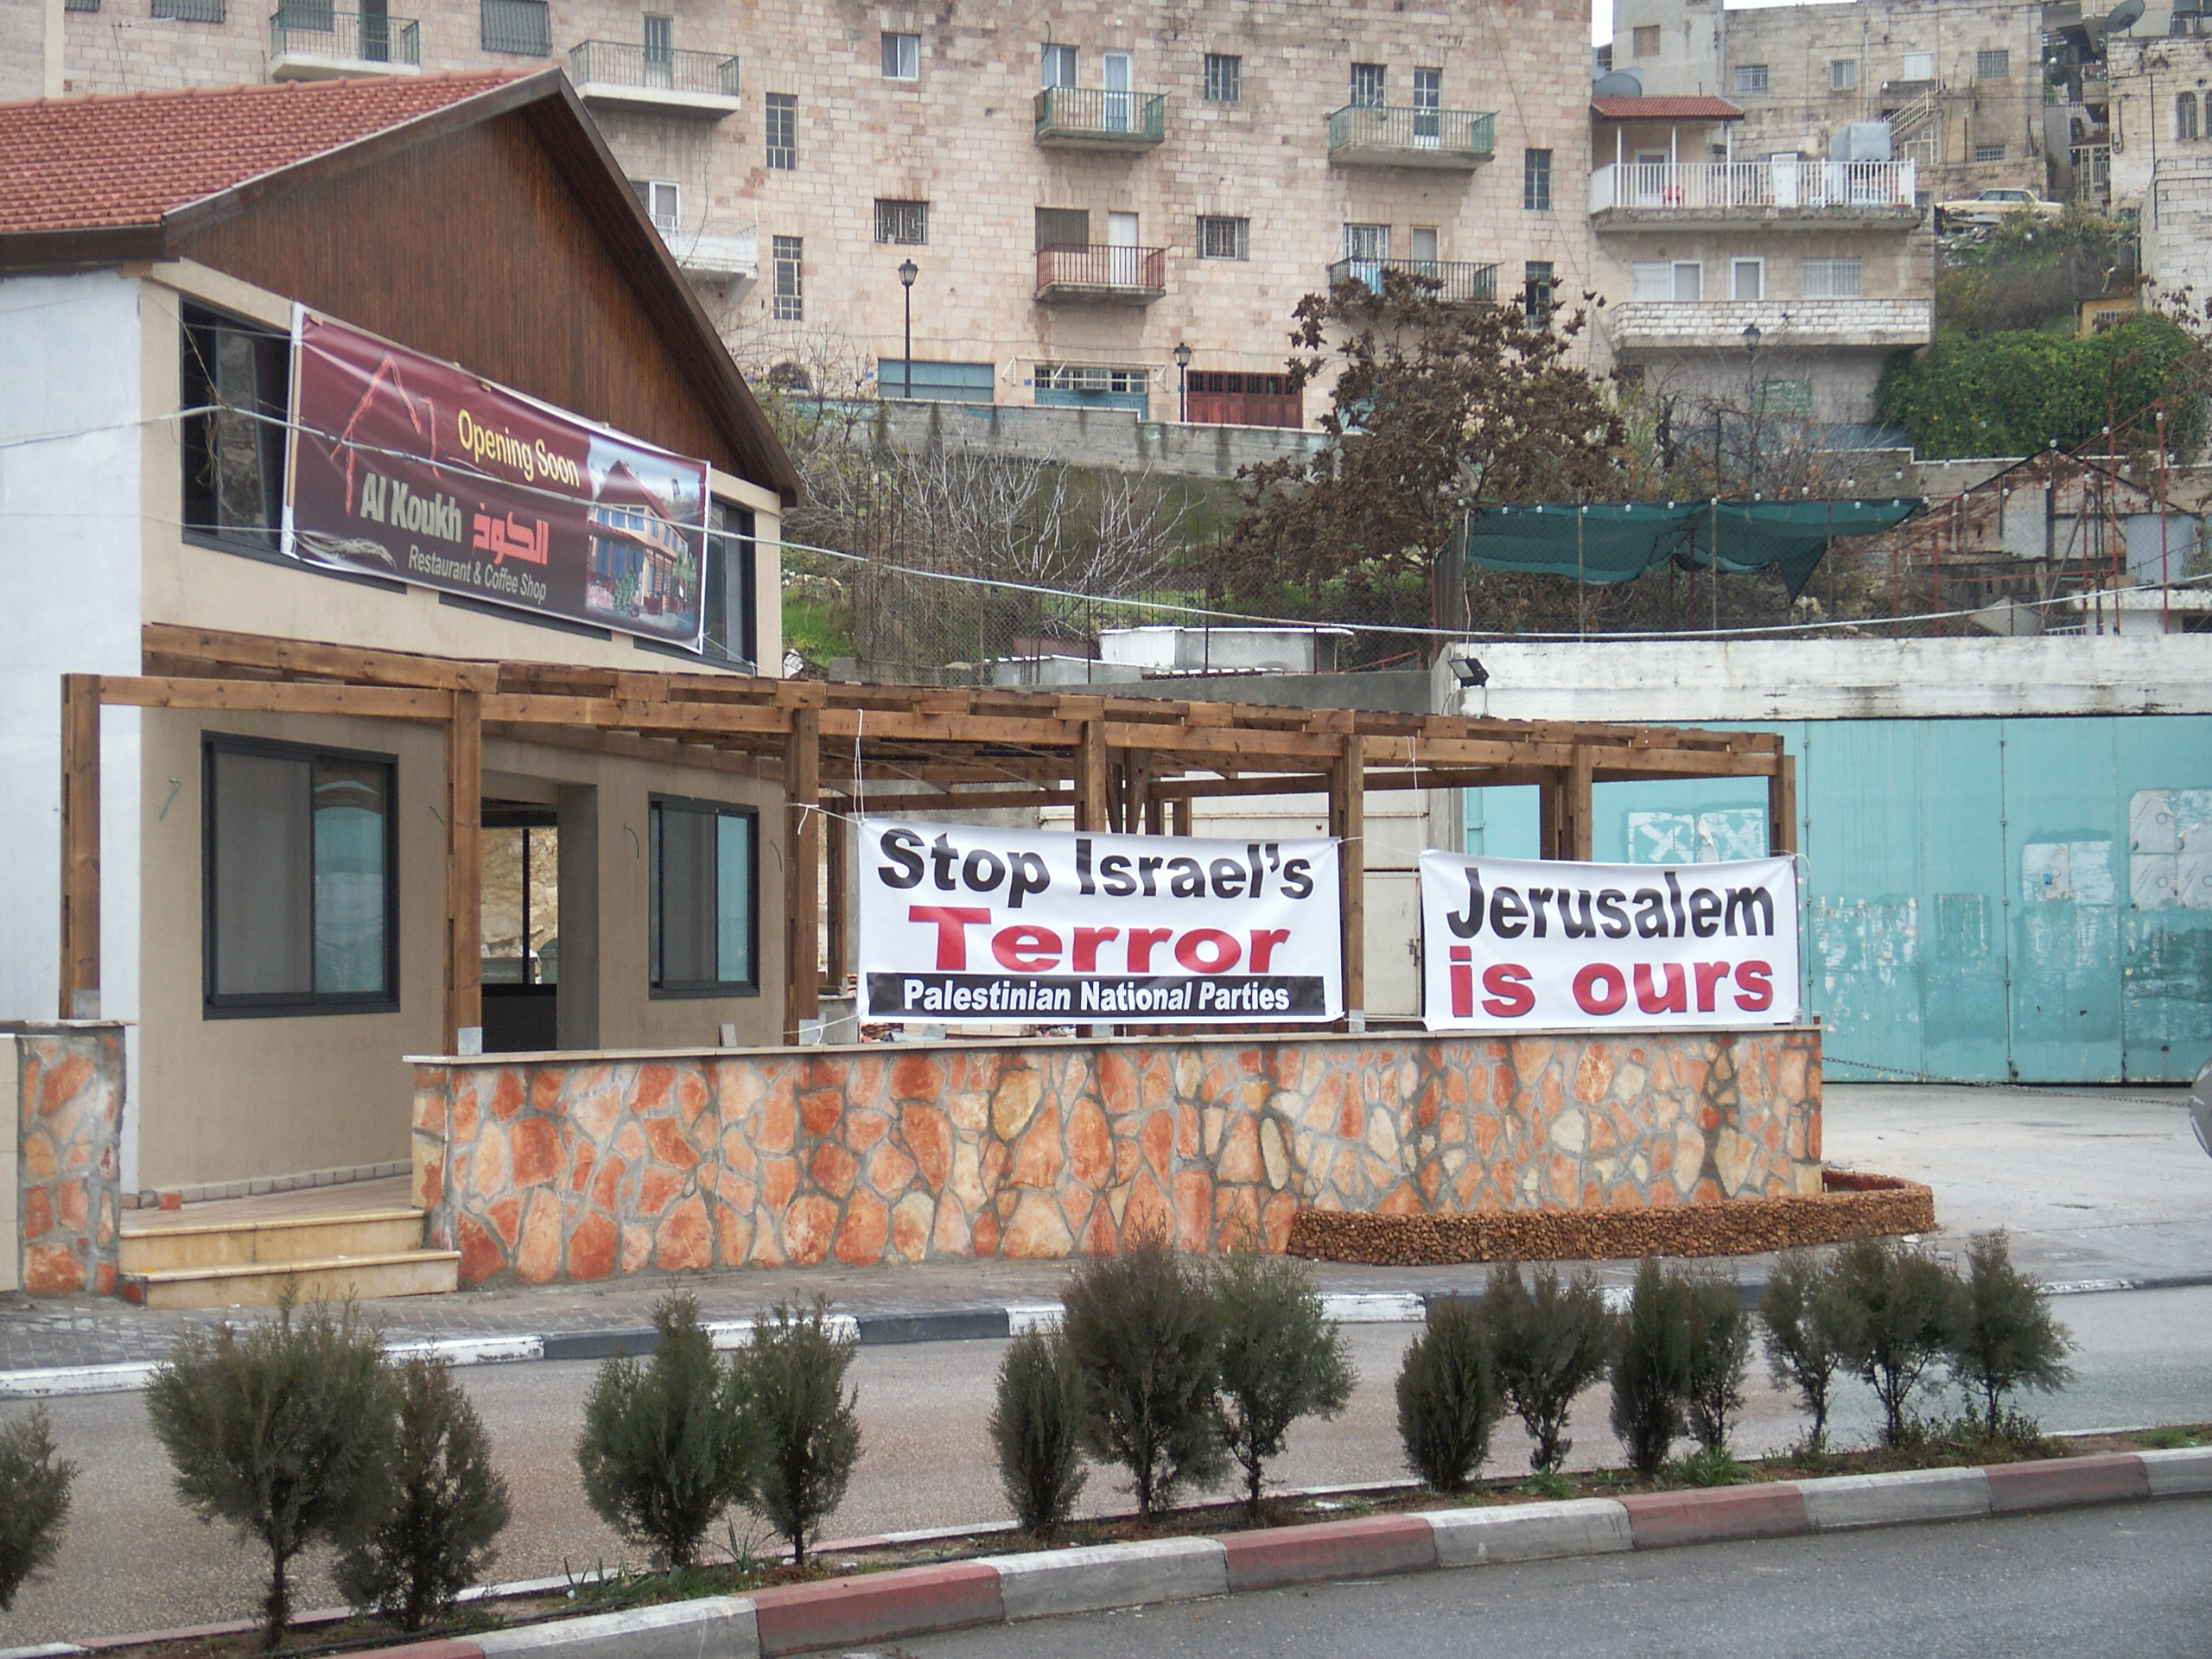 bethlehem-propaganda-for-buhs-visit.jpg